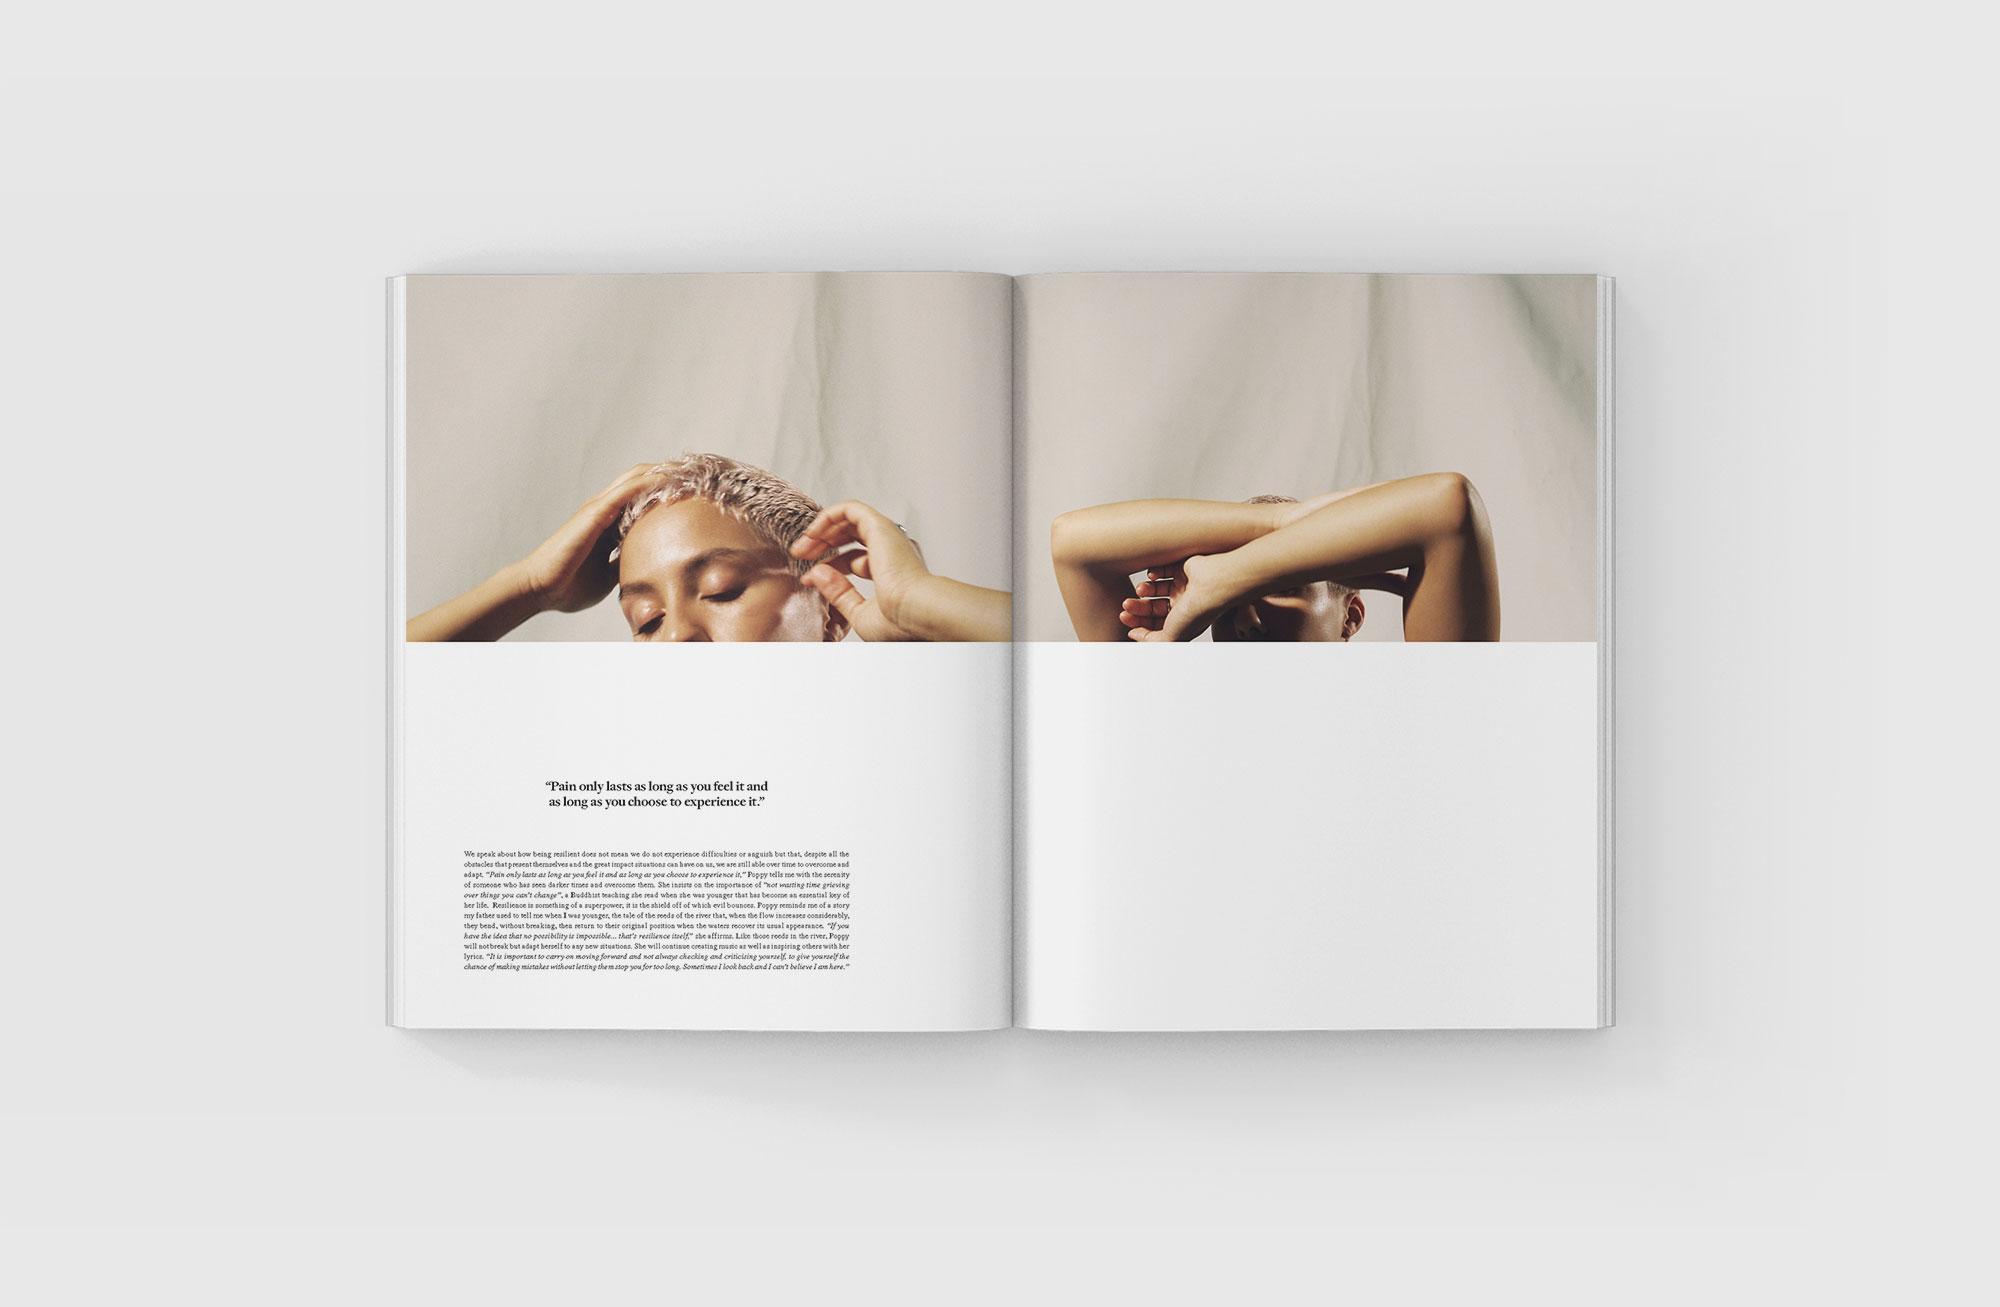 jungle-magazine-02-34.jpg